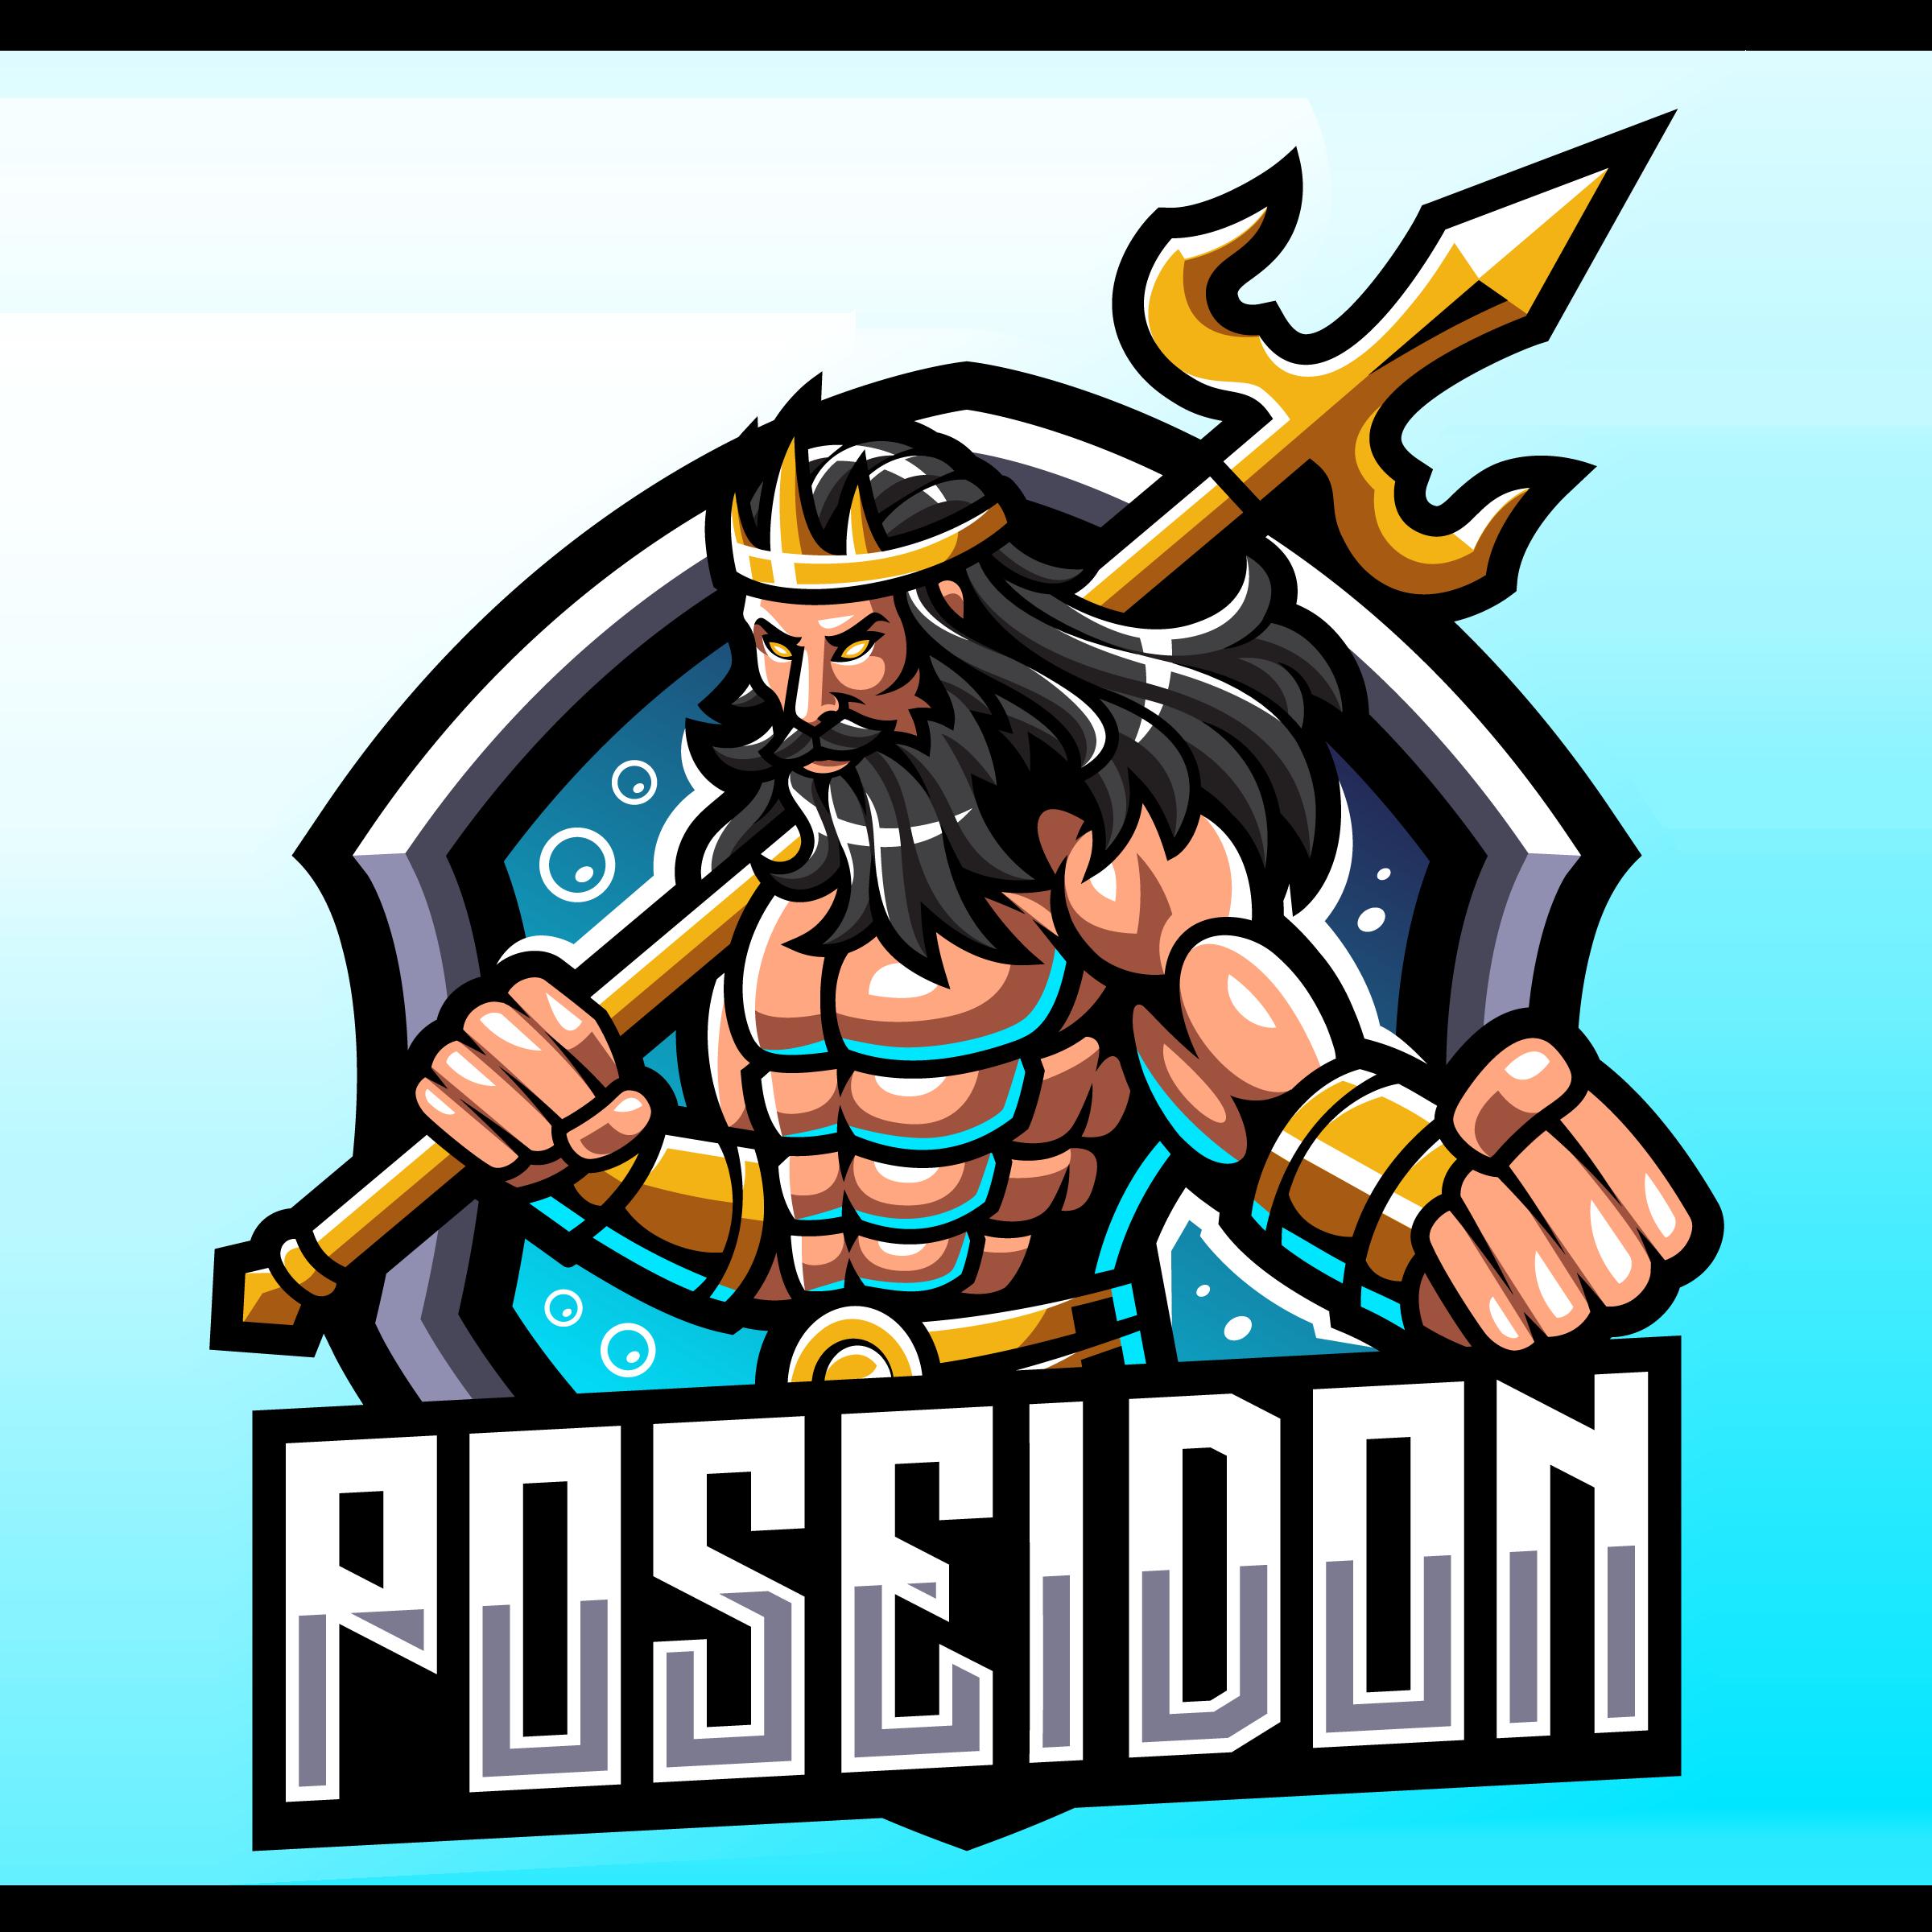 Poseidon-Mascot-Logo-PNG-Transparent